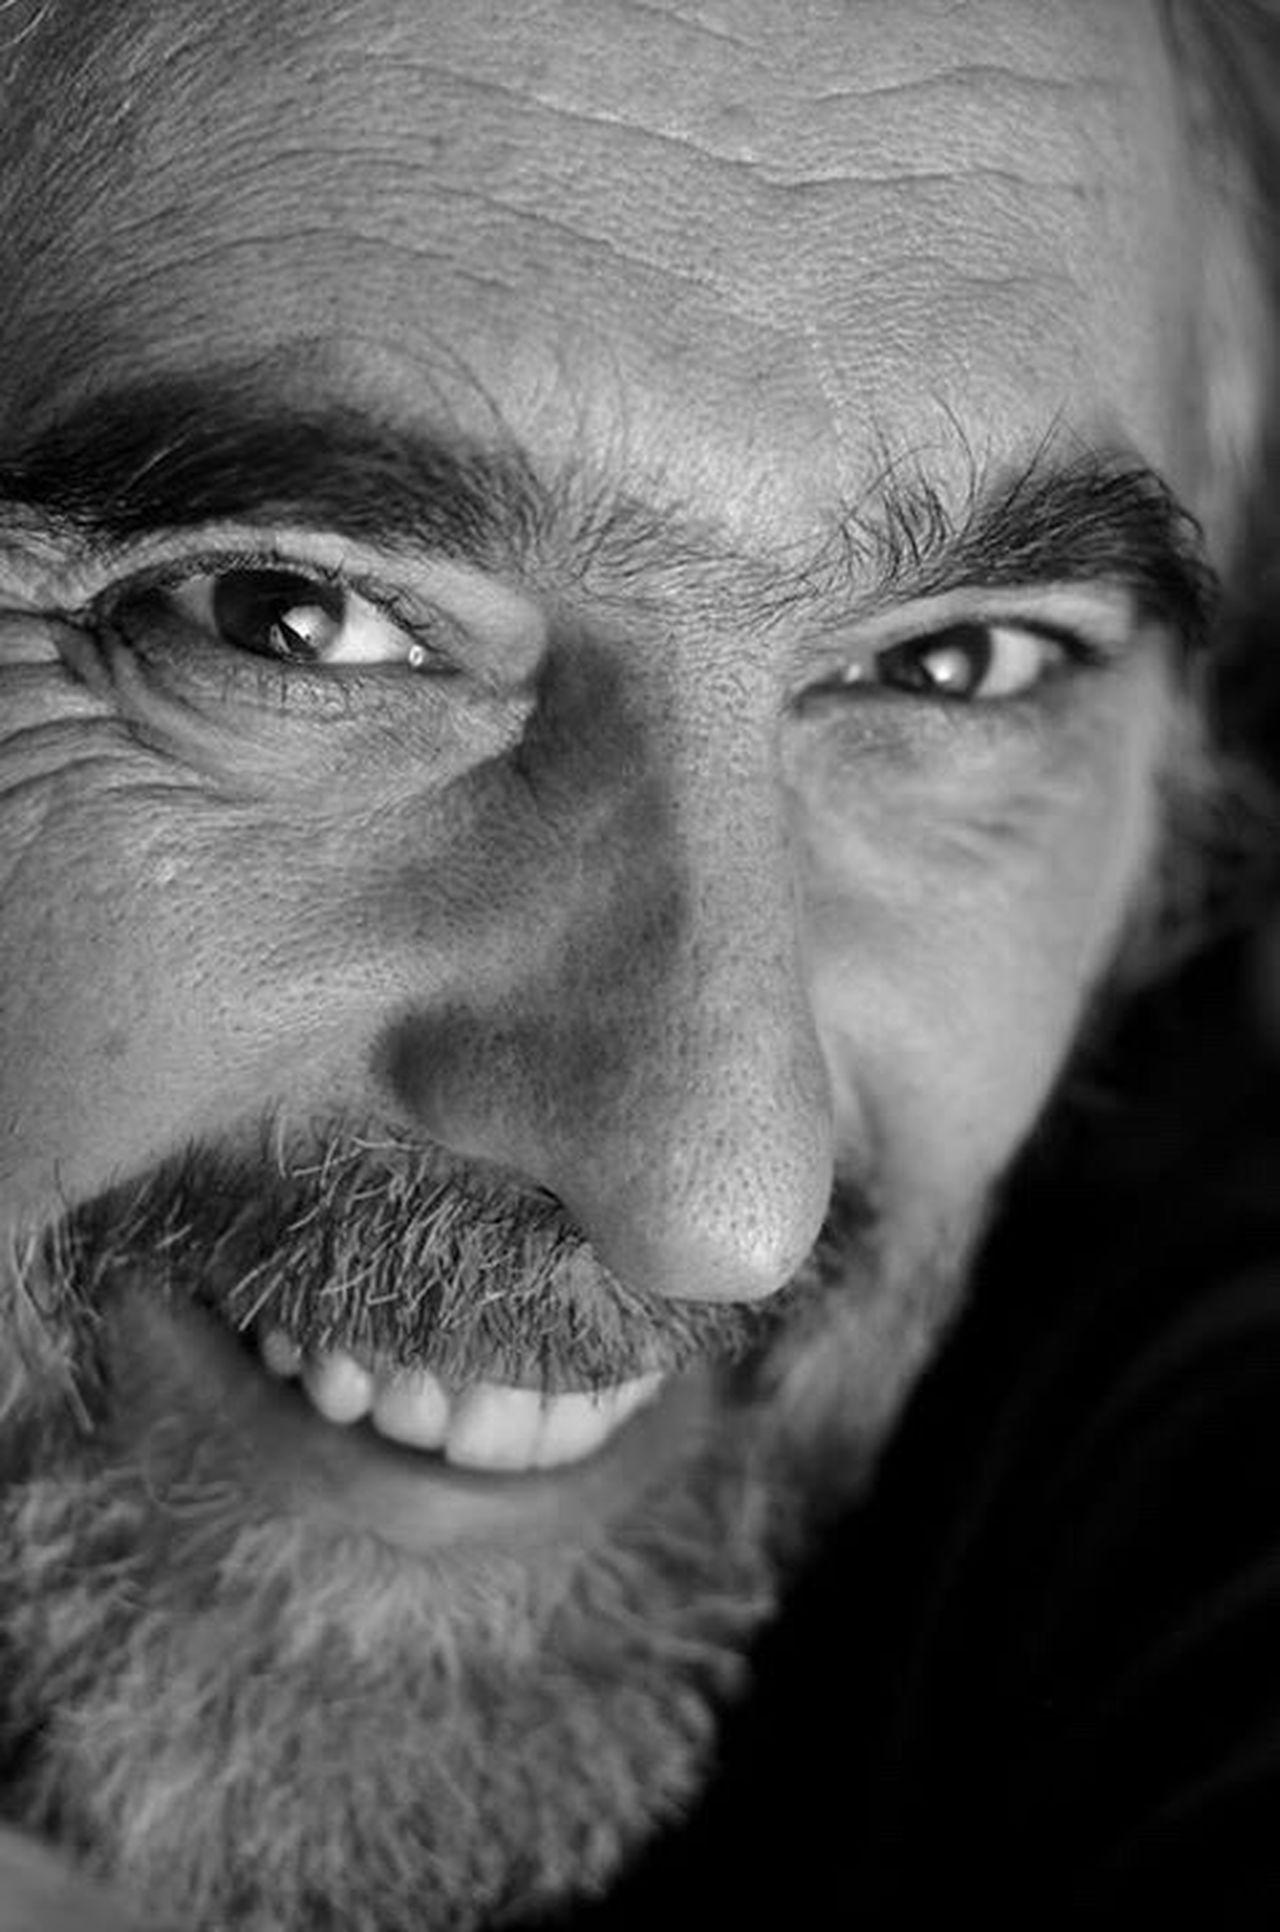 Autoportrait ... Never forget to smile ! Human Face Self Portrait Selfportrait Selfie Portrait Autoportrait Selfie ✌